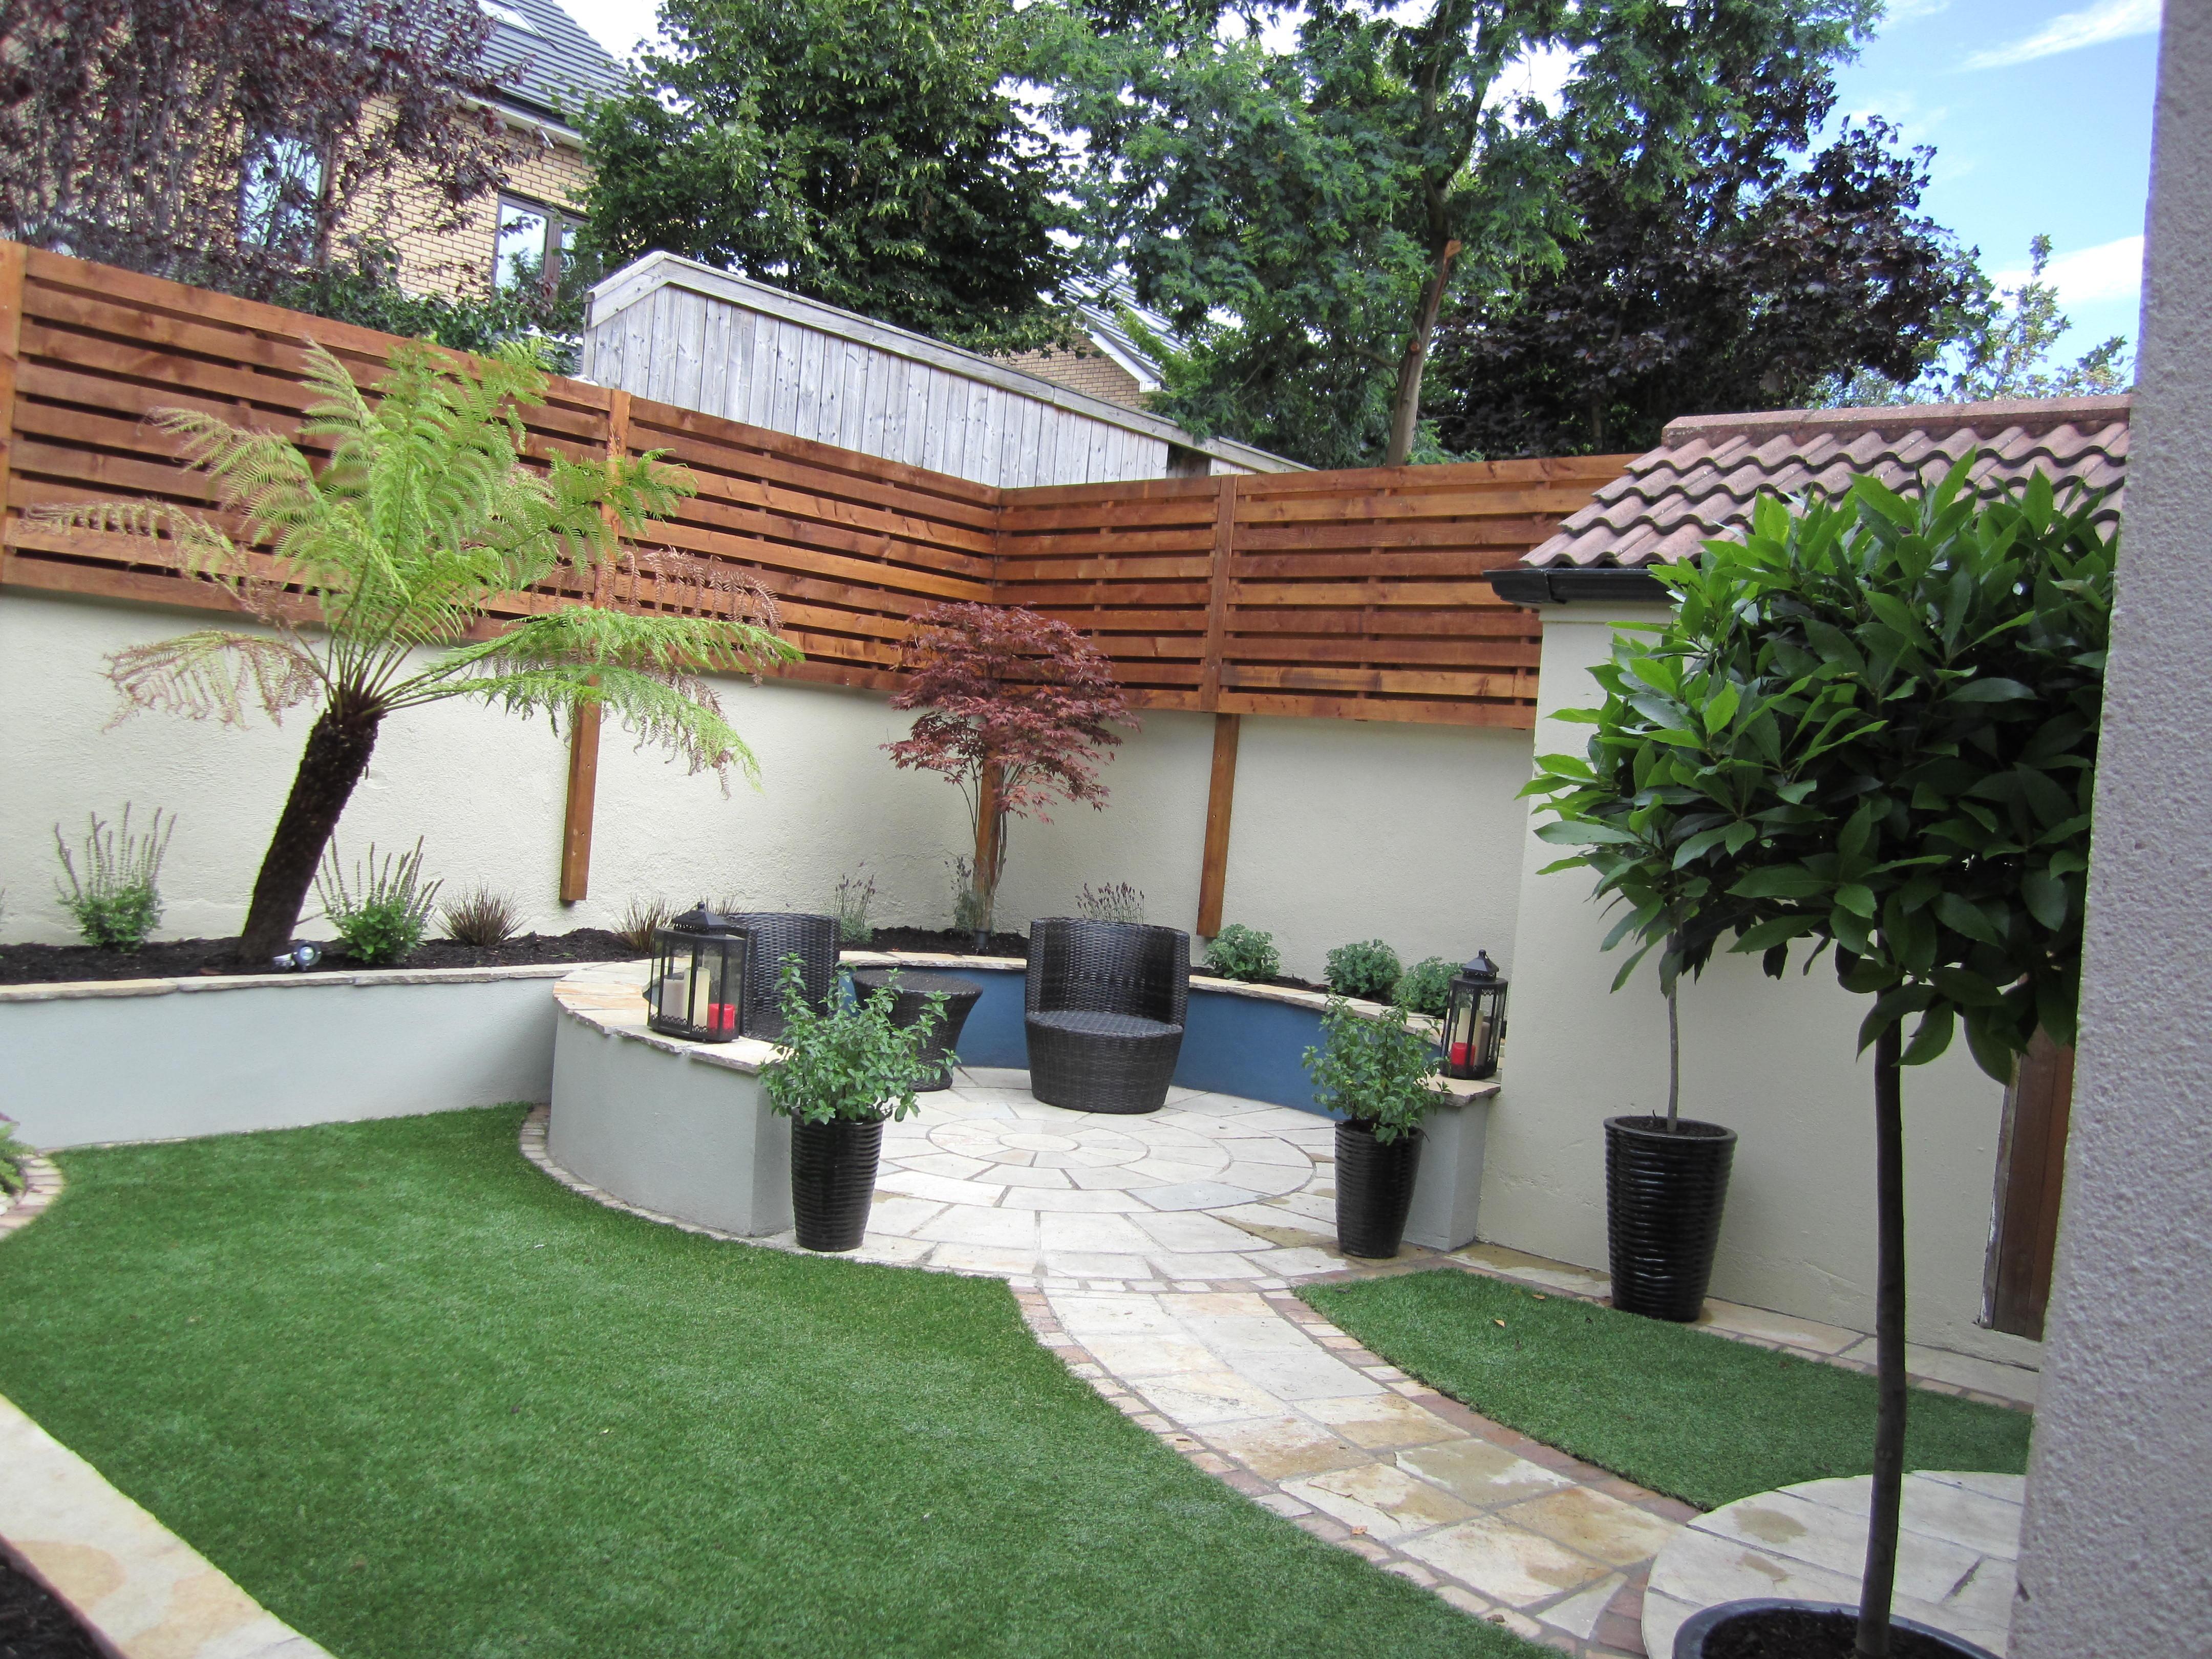 Low maintenance landscaping garden design stillorgan co for Garden design ideas northern ireland